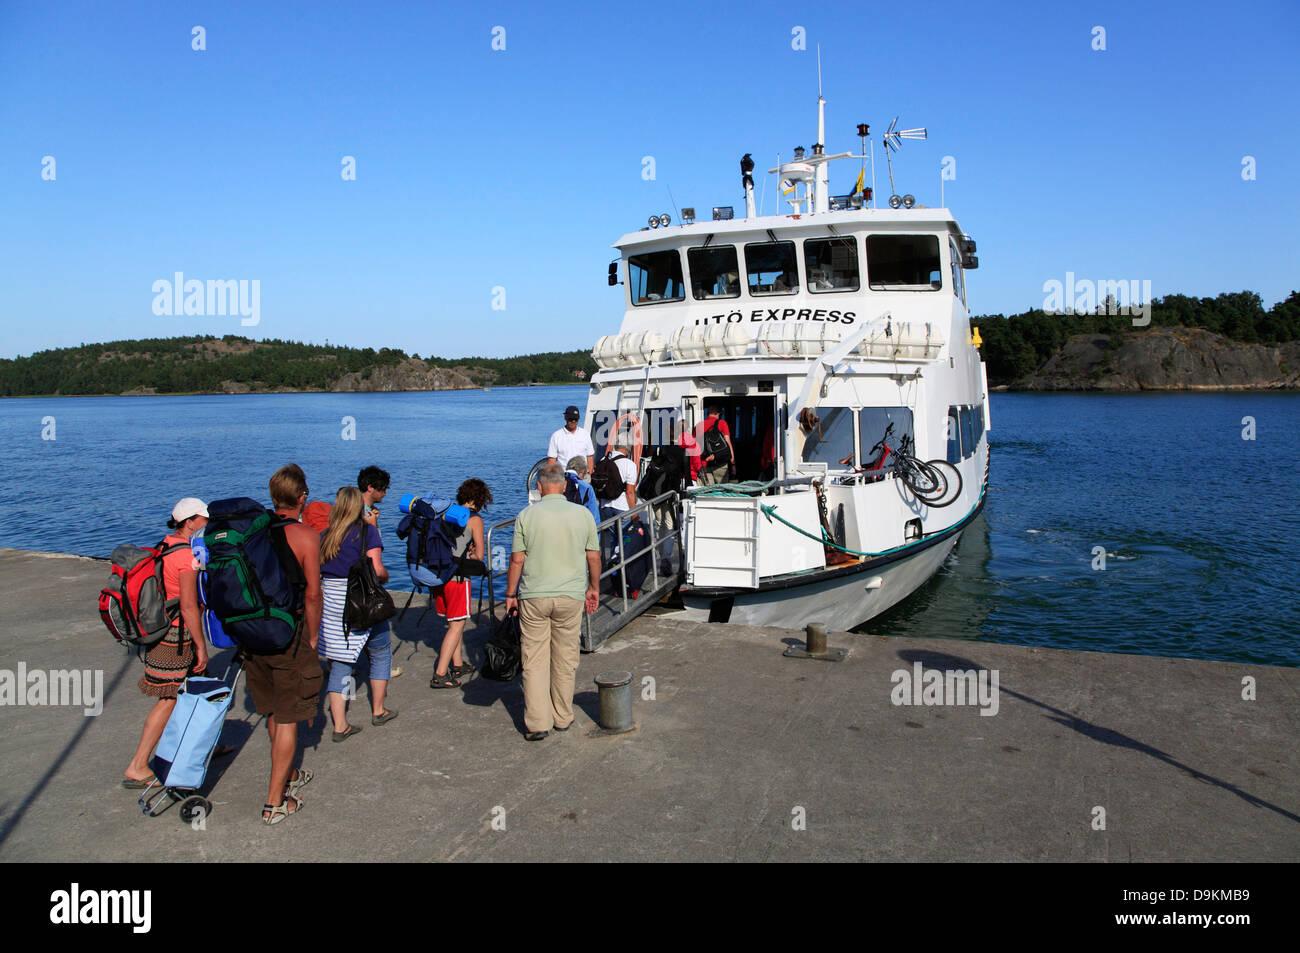 Ferry to little islands, Stockholm archipelago, baltic sea coast, Sweden, Scandinavia - Stock Image